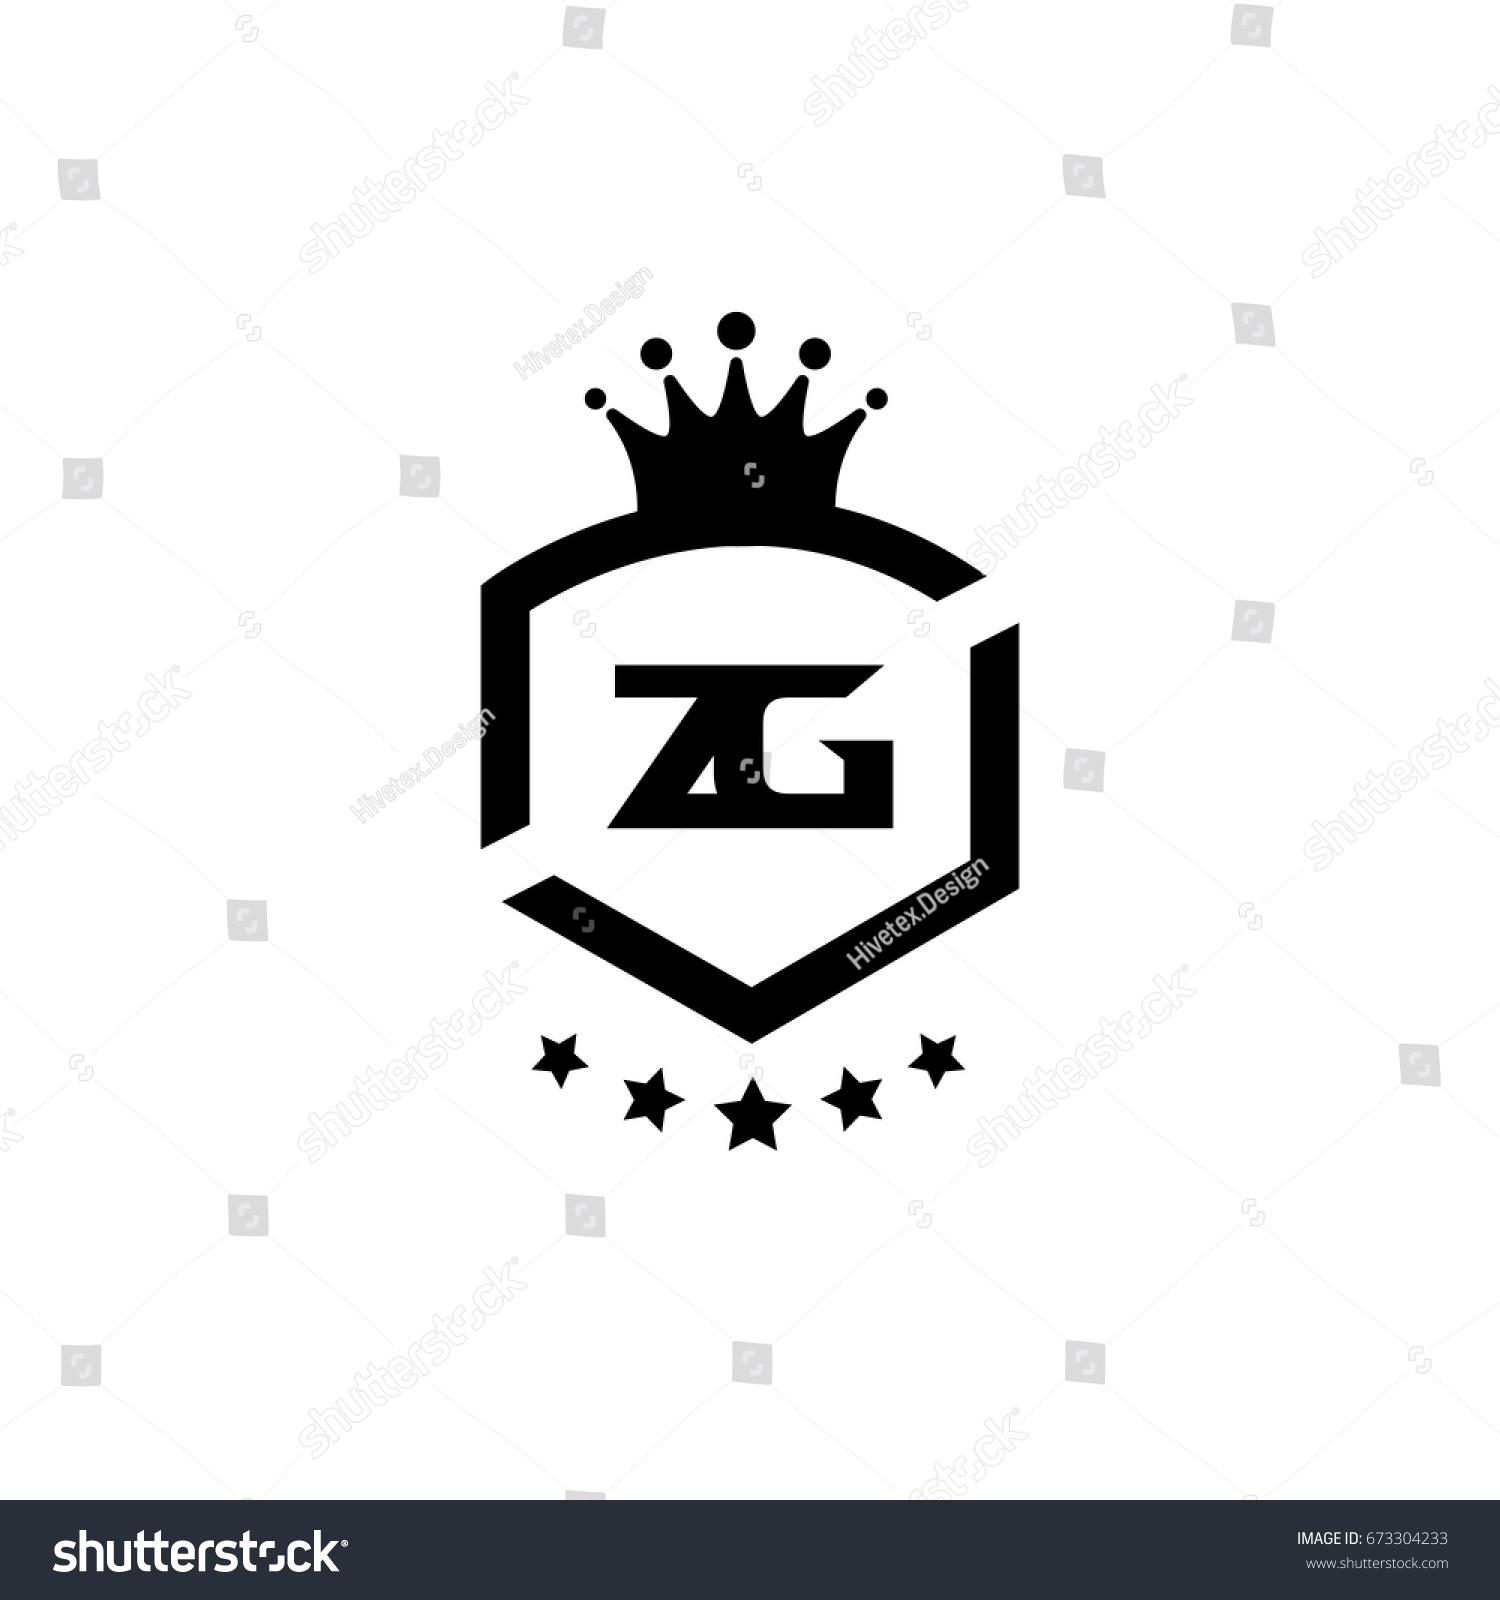 zg logo stock vector 673304233